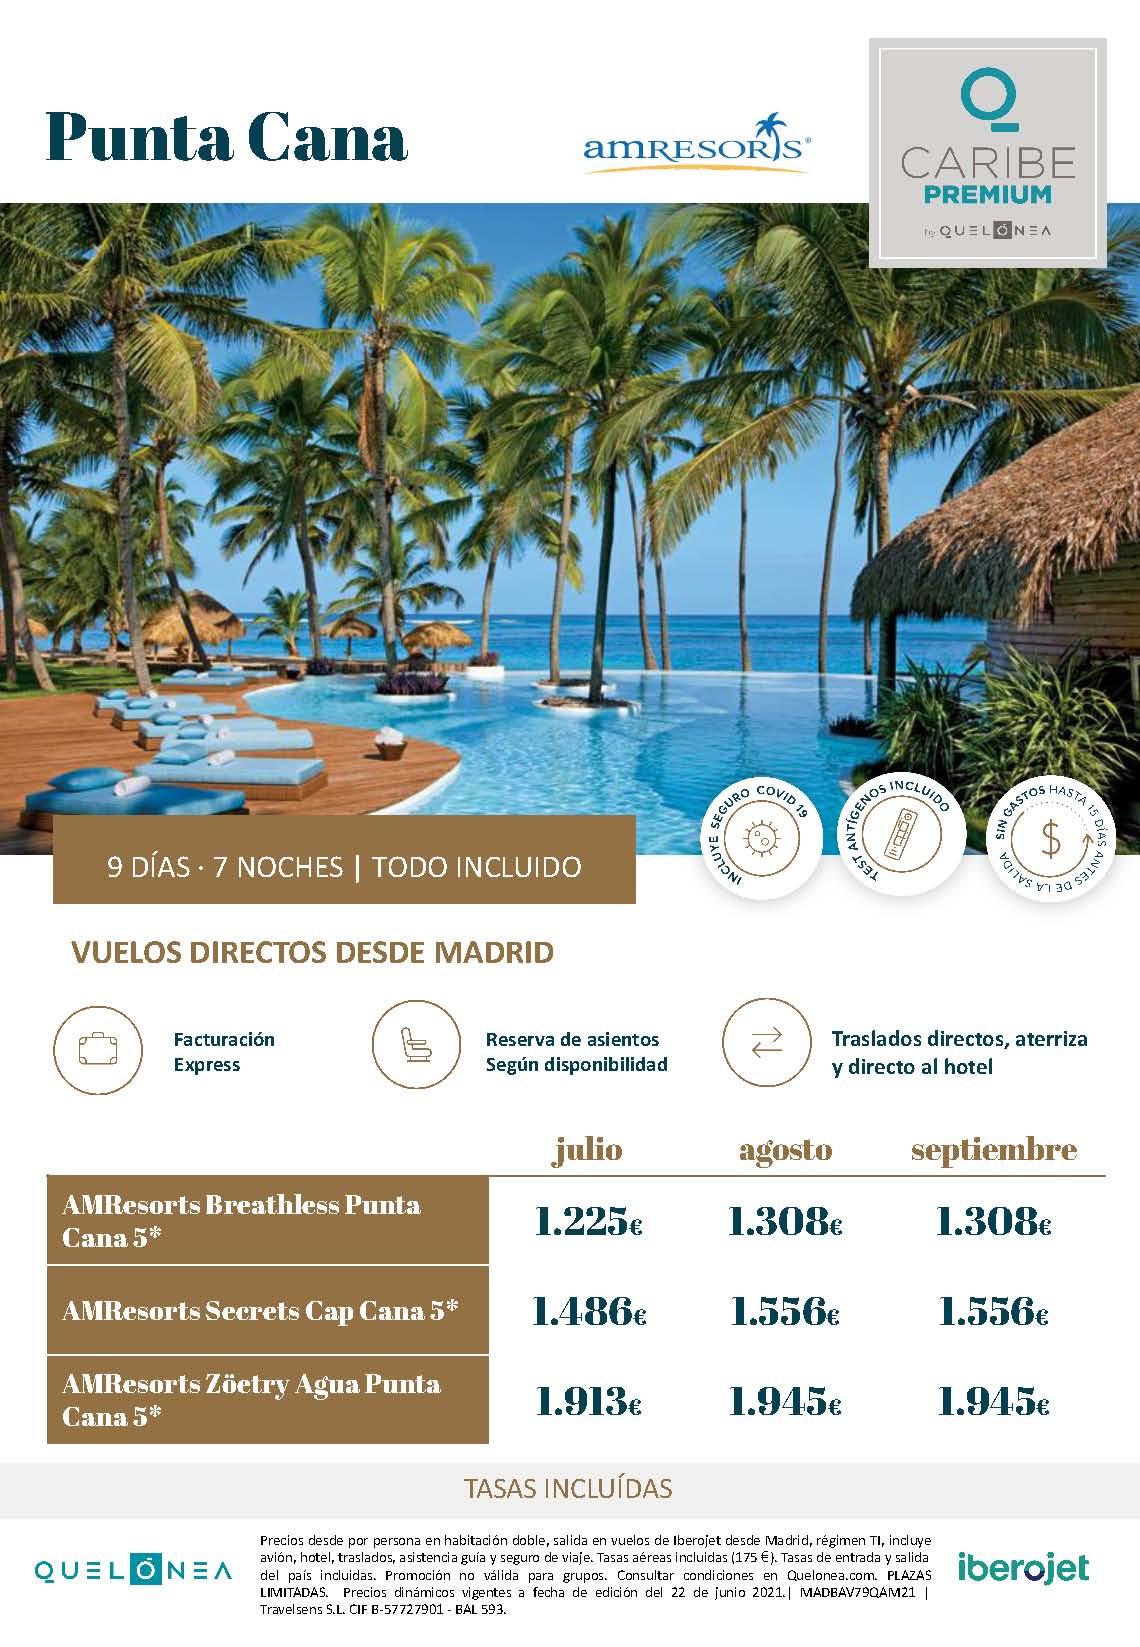 Ofertas Quelonea Caribe Premium Verano 2021 Punta Cana AM Resorts vuelo directo desde Madrid